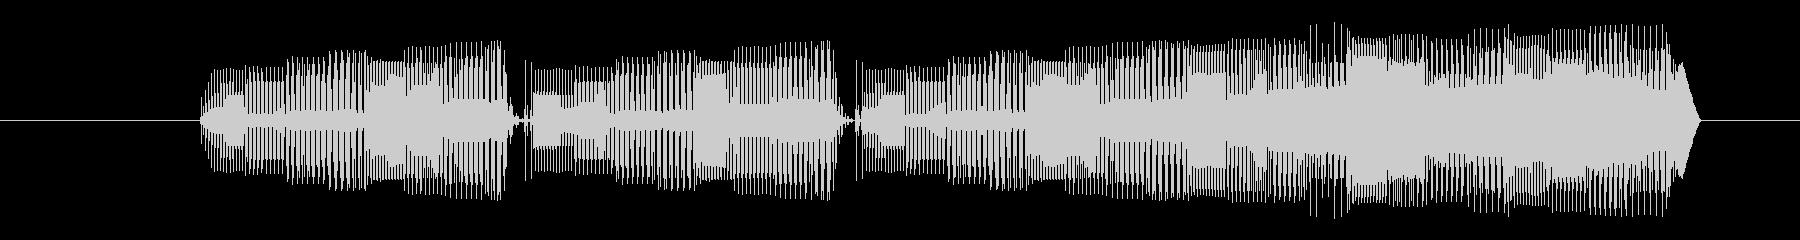 FX 合成シューティング01の未再生の波形